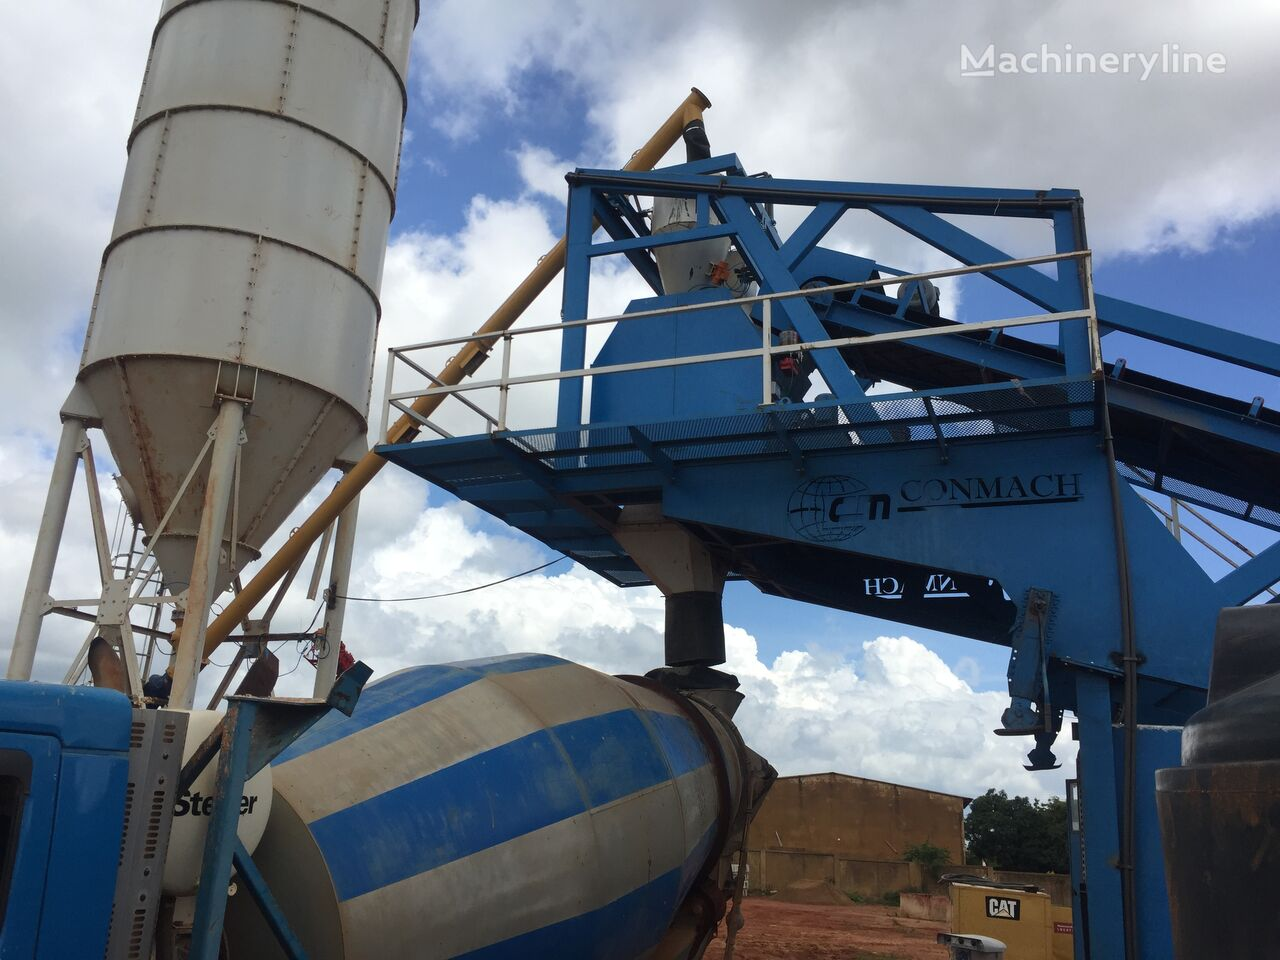 nieuw CONMACH MobKing-60 Concrete Mobile Batching Plant - 50 m3/h betoncentrale